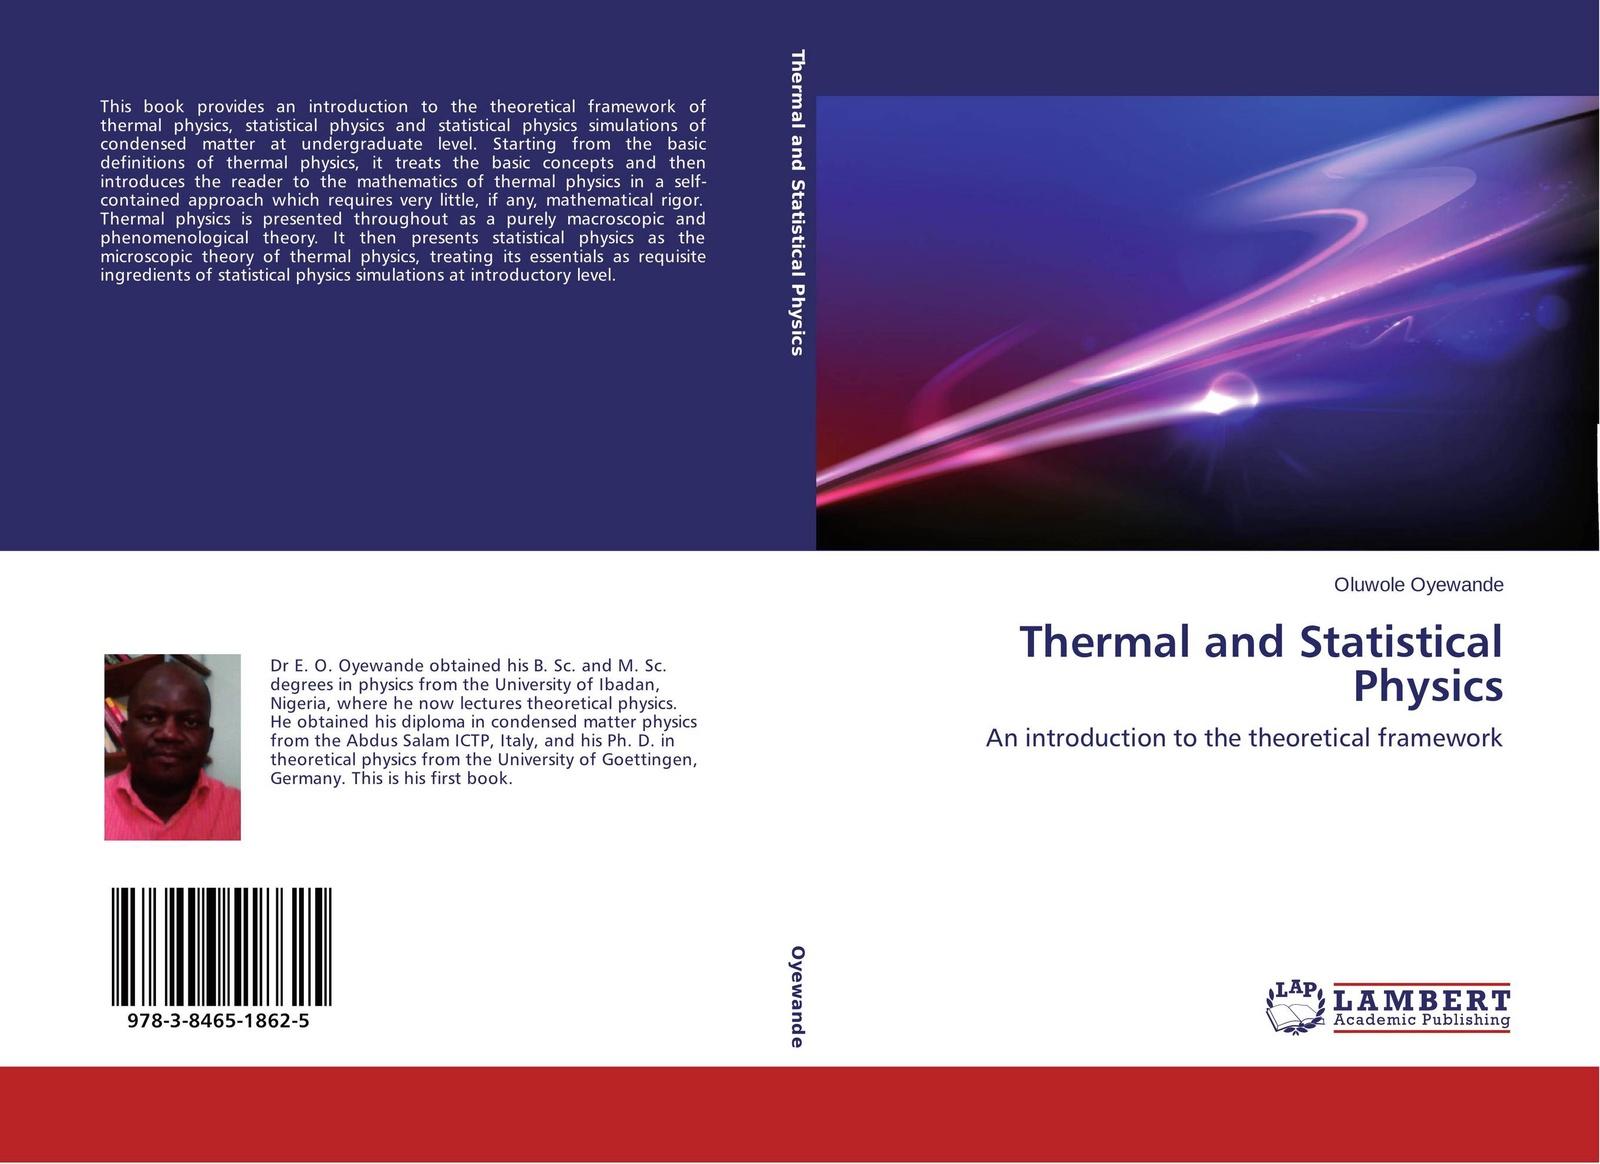 Oluwole Oyewande Thermal and Statistical Physics statistical physics and thermodynamics